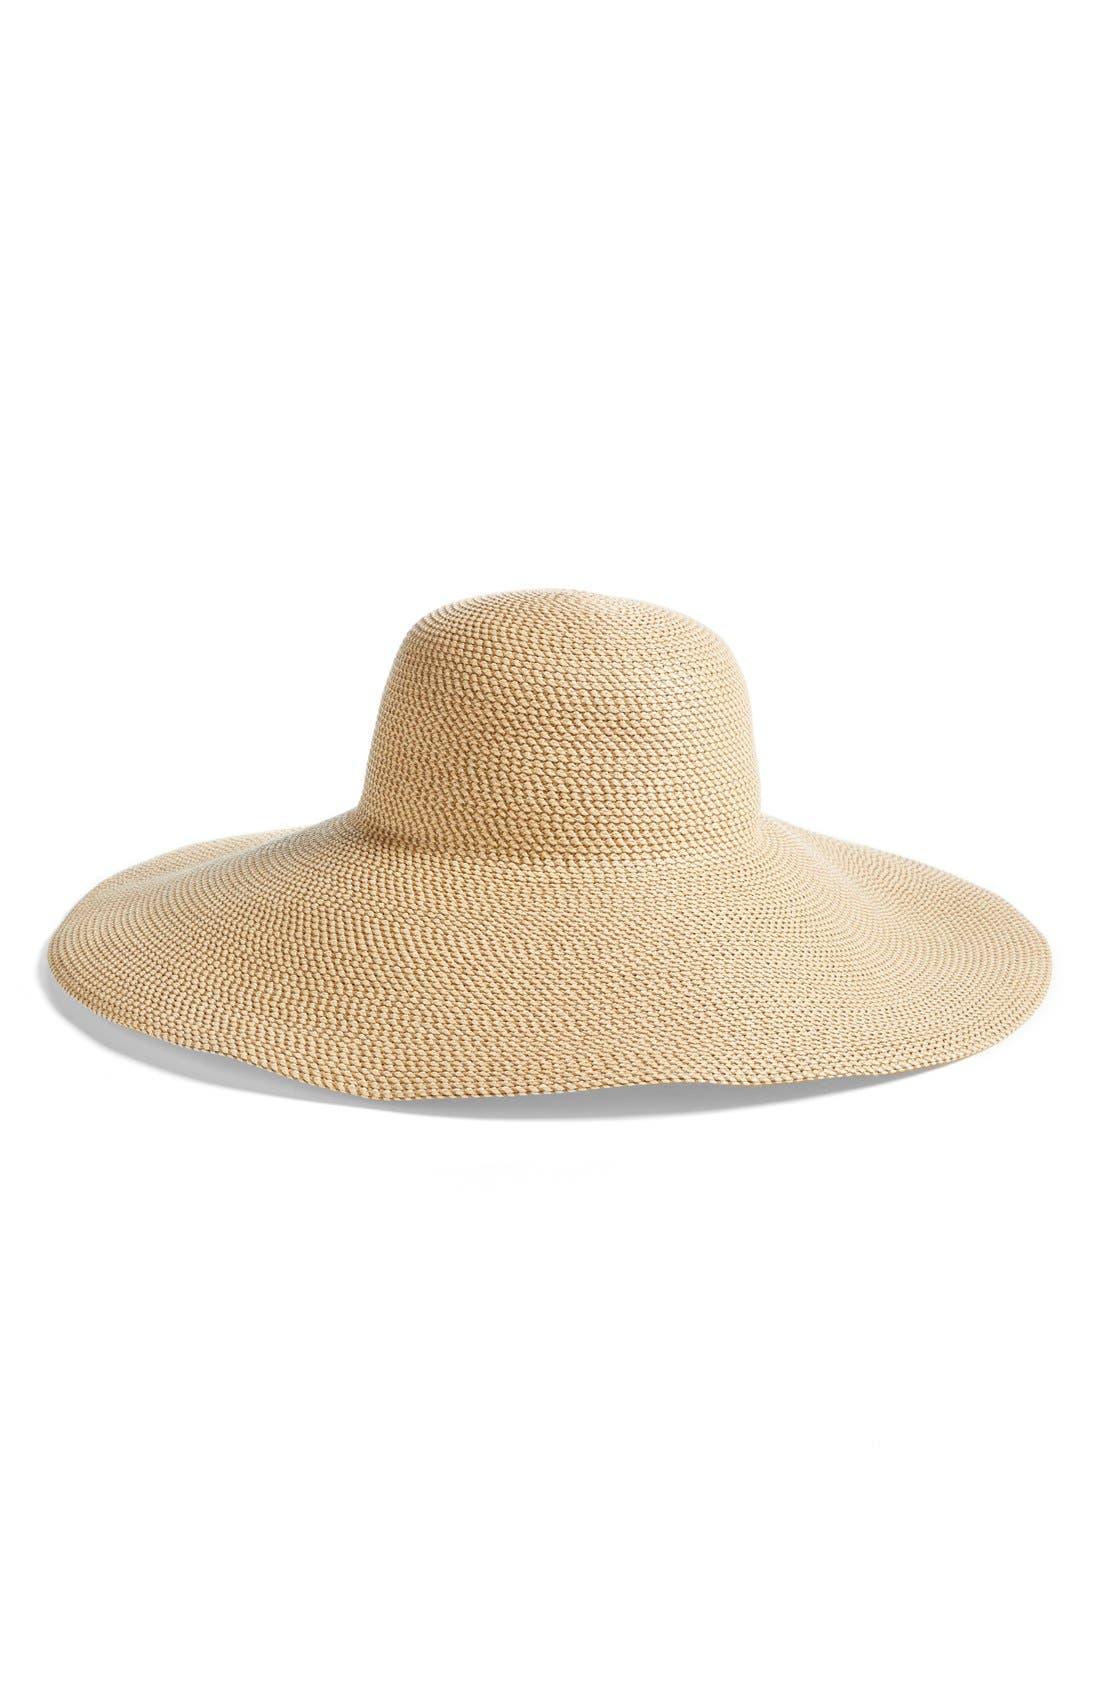 Floppy Straw Hat,                         Main,                         color, PEANUT